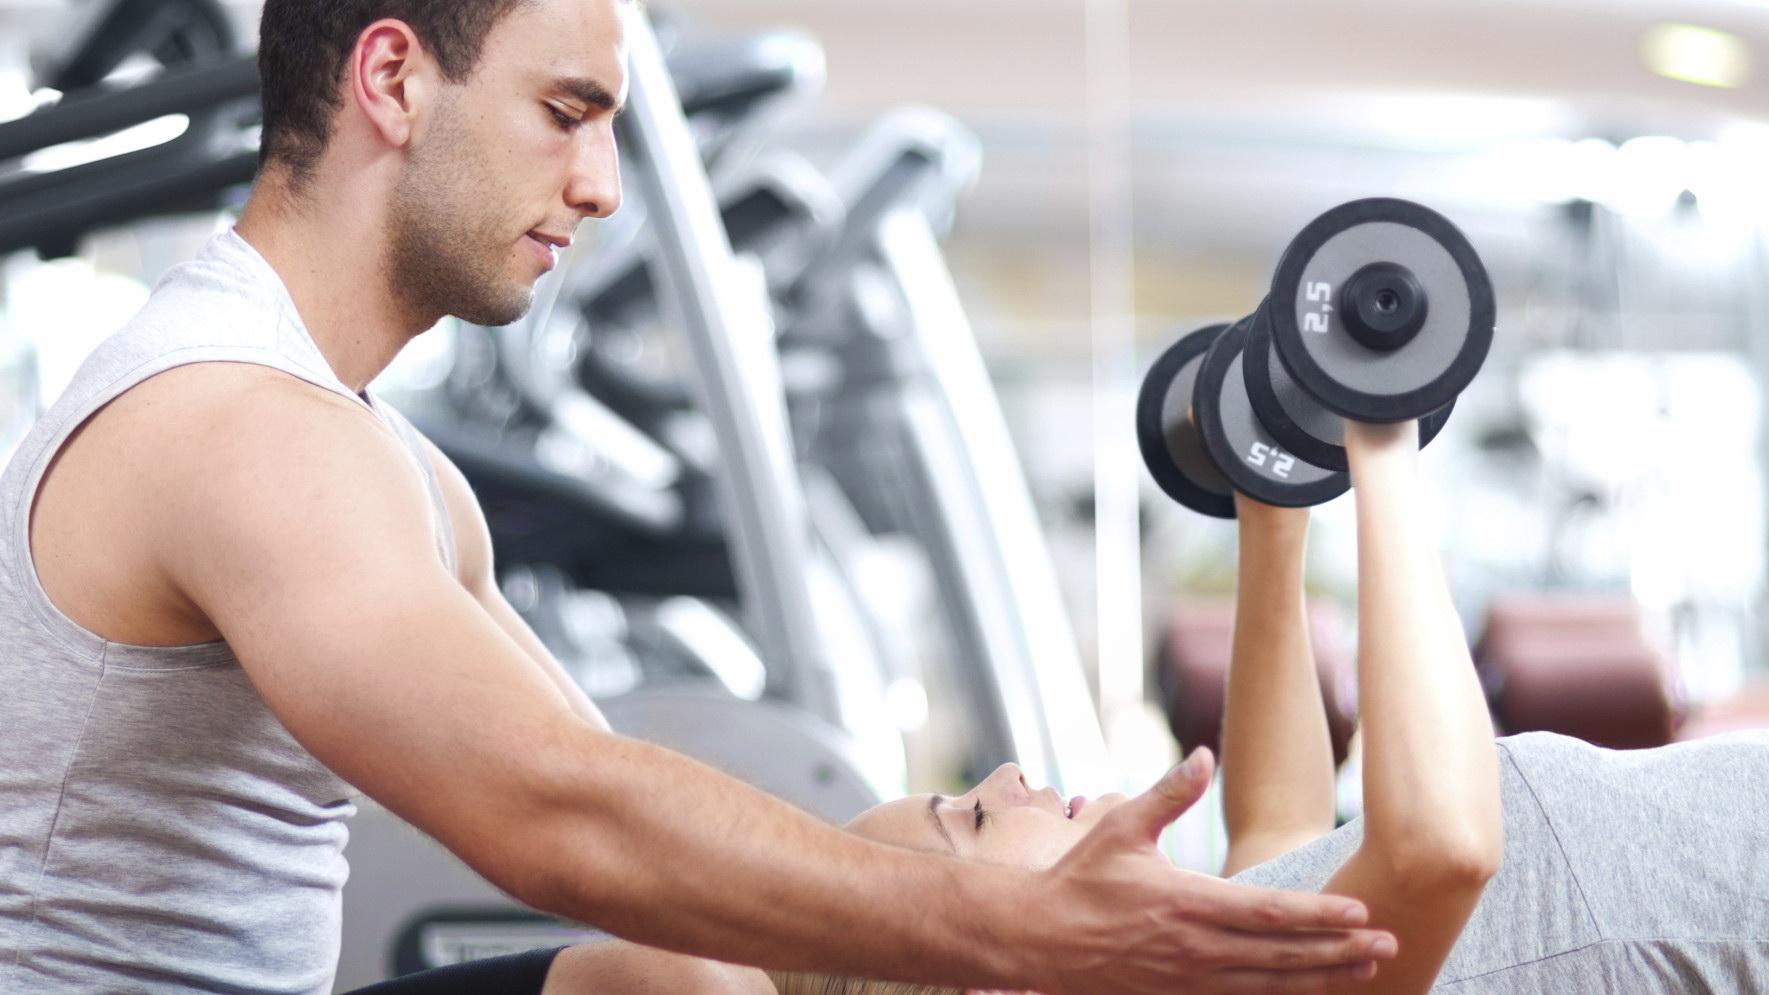 Фитнес клуб знакомство с мужчинами